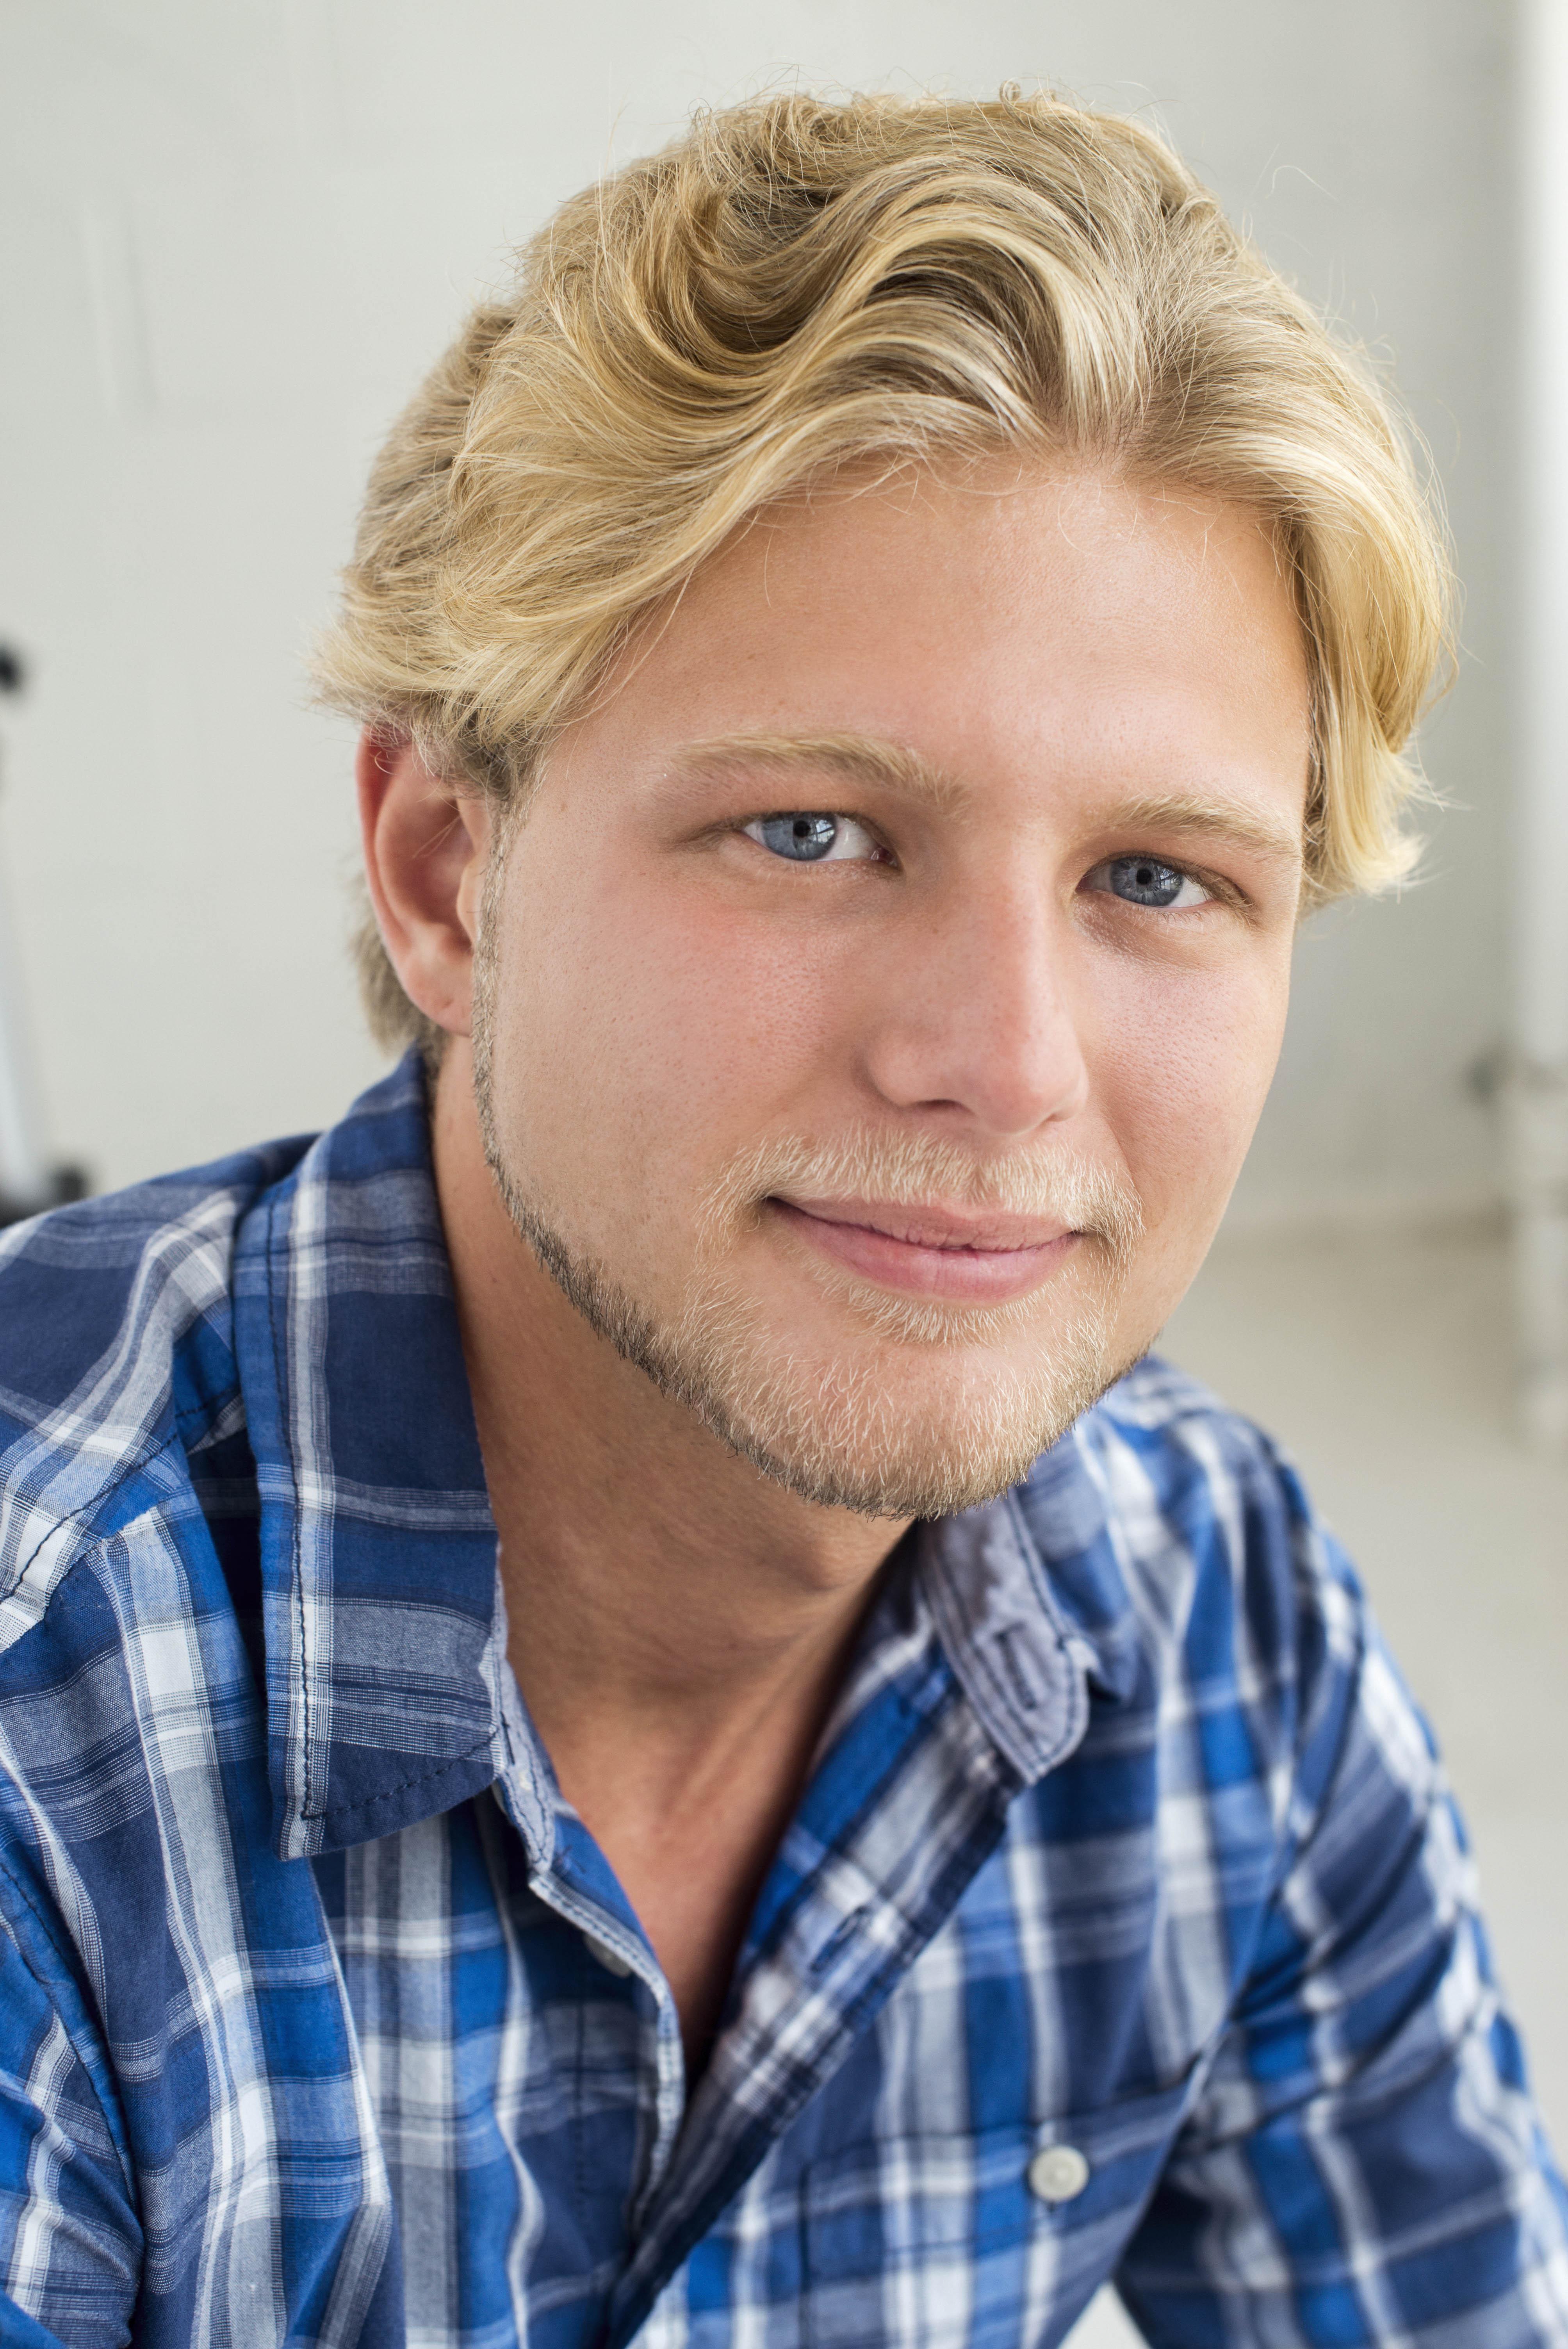 BlondeBlueChekShirt